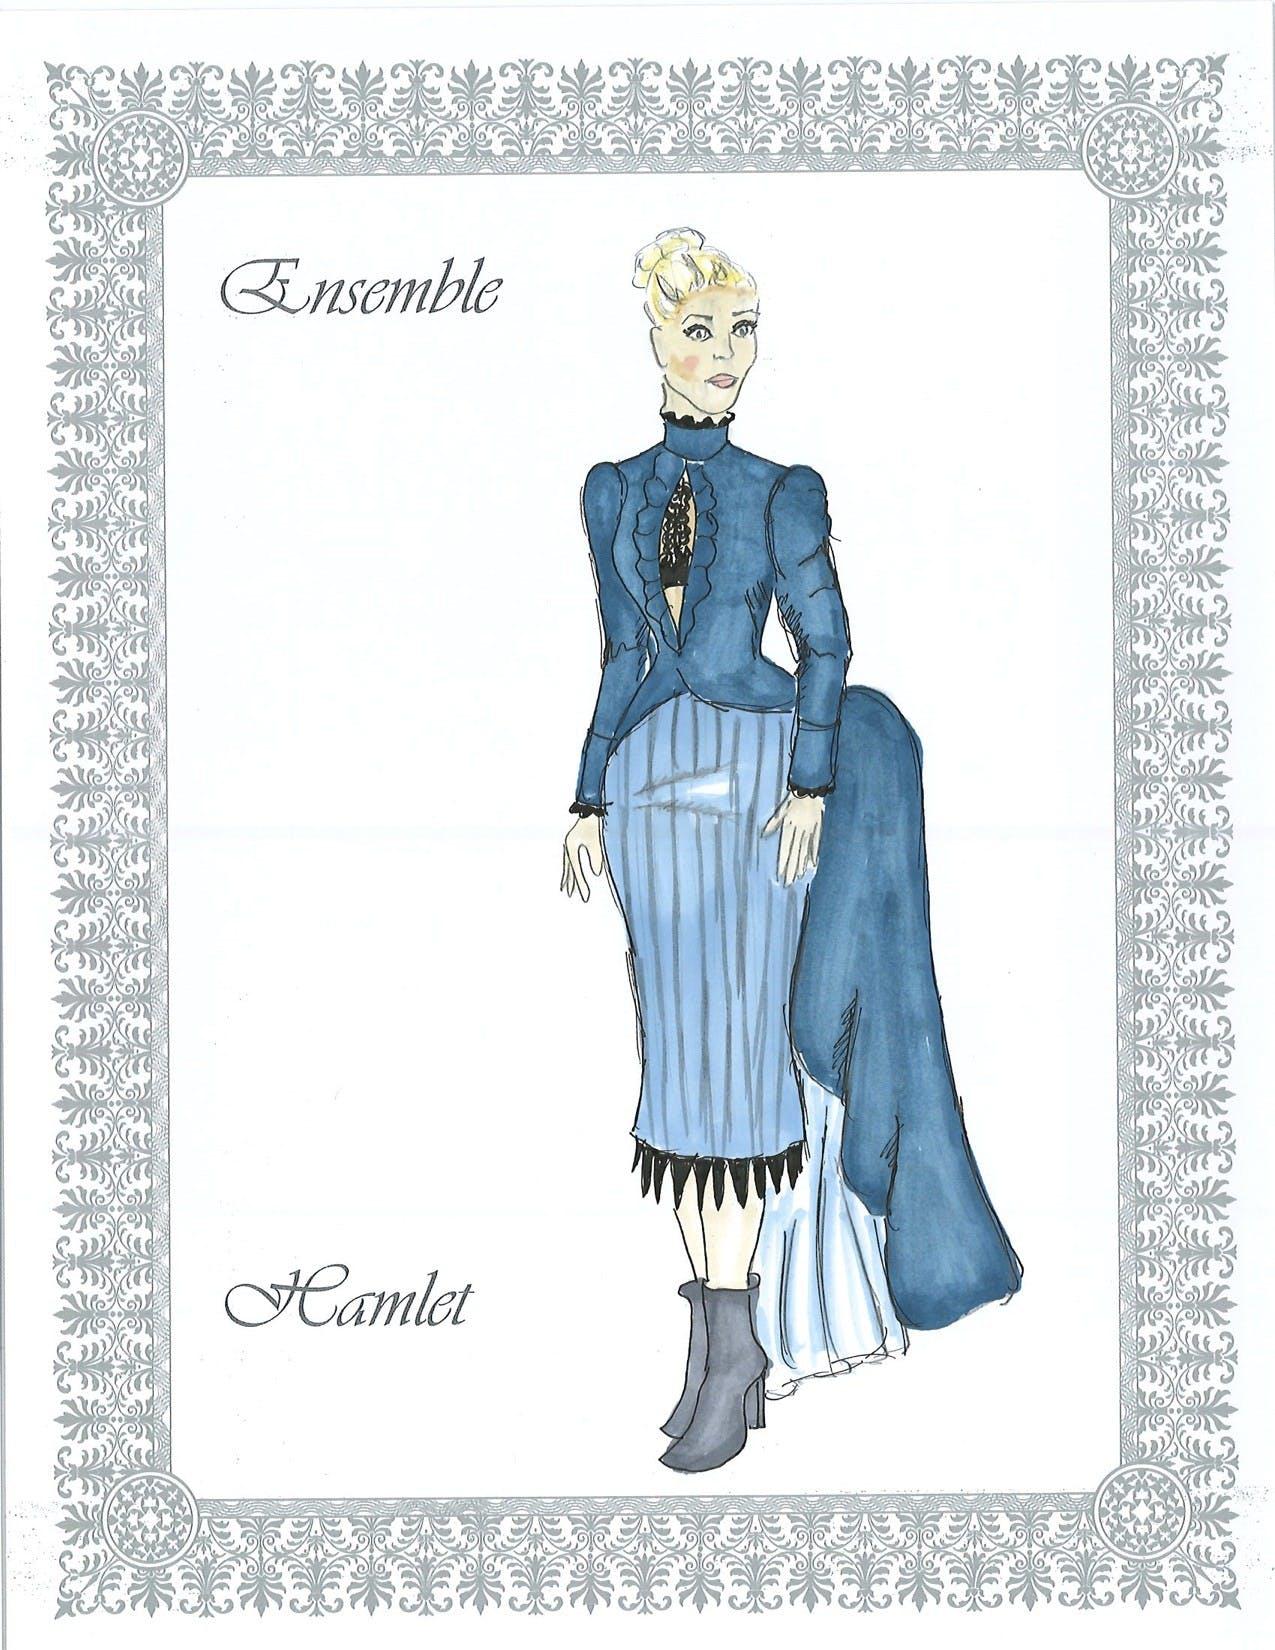 Ensemble costume design